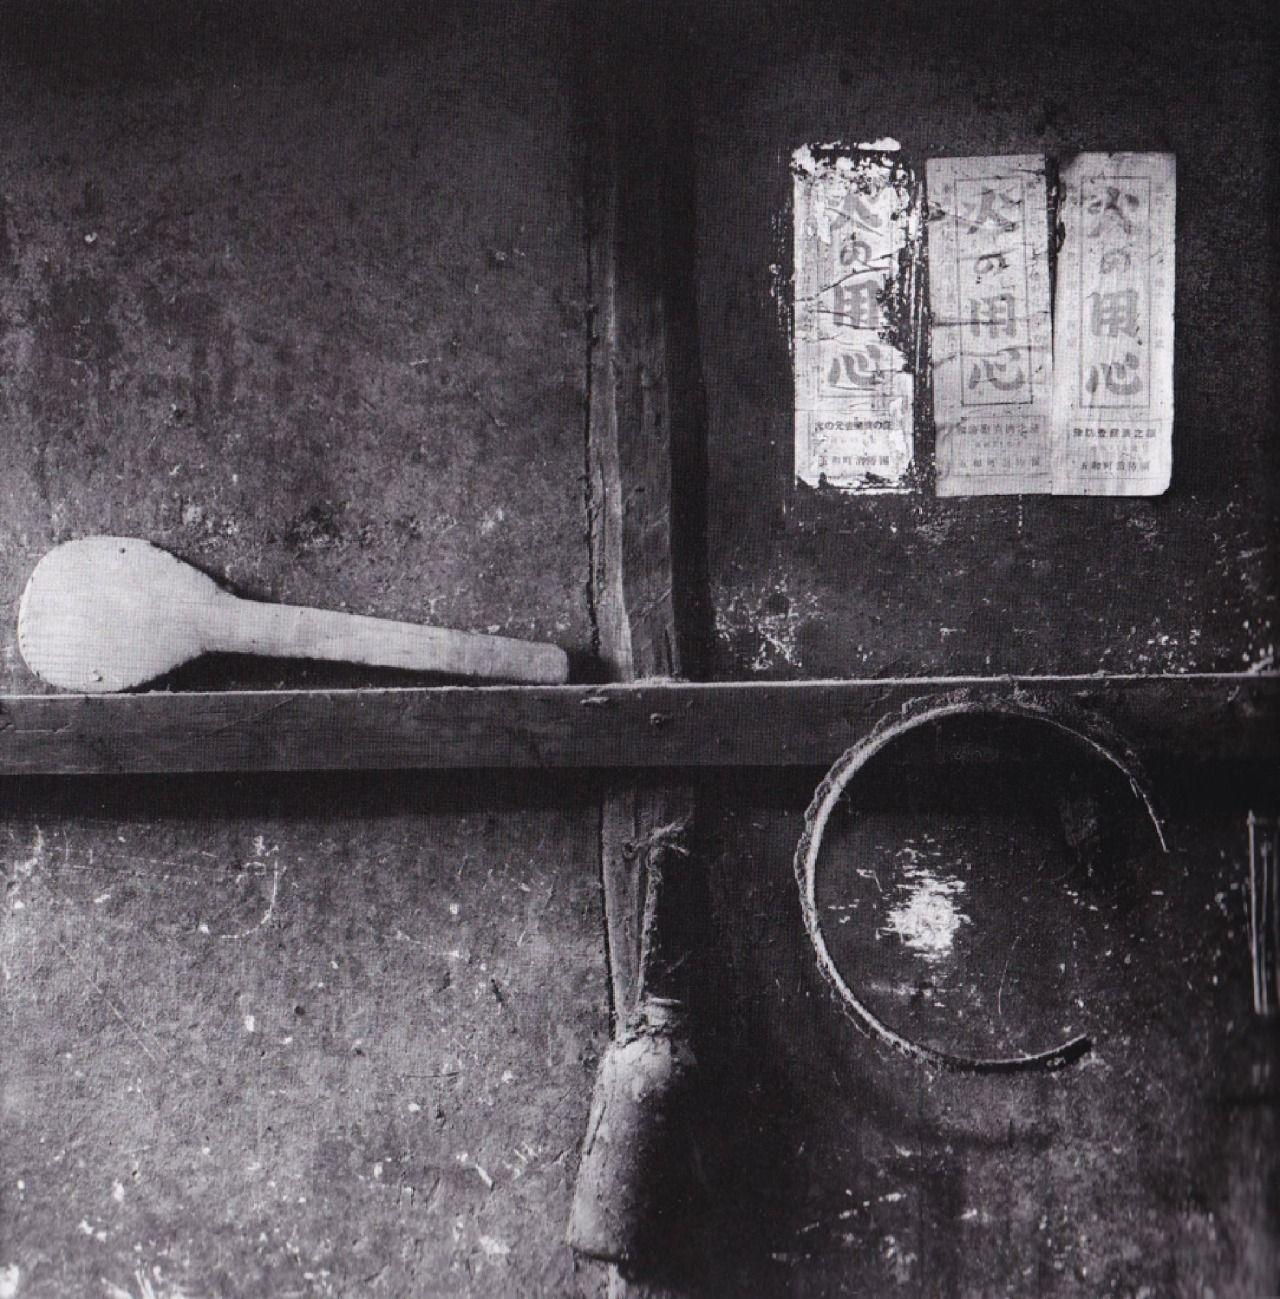 House No.9 (Amakusa, Kumamoto, Kyushu, Japan, 1959.) © Shōmei Tōmatsu (東松 照明)